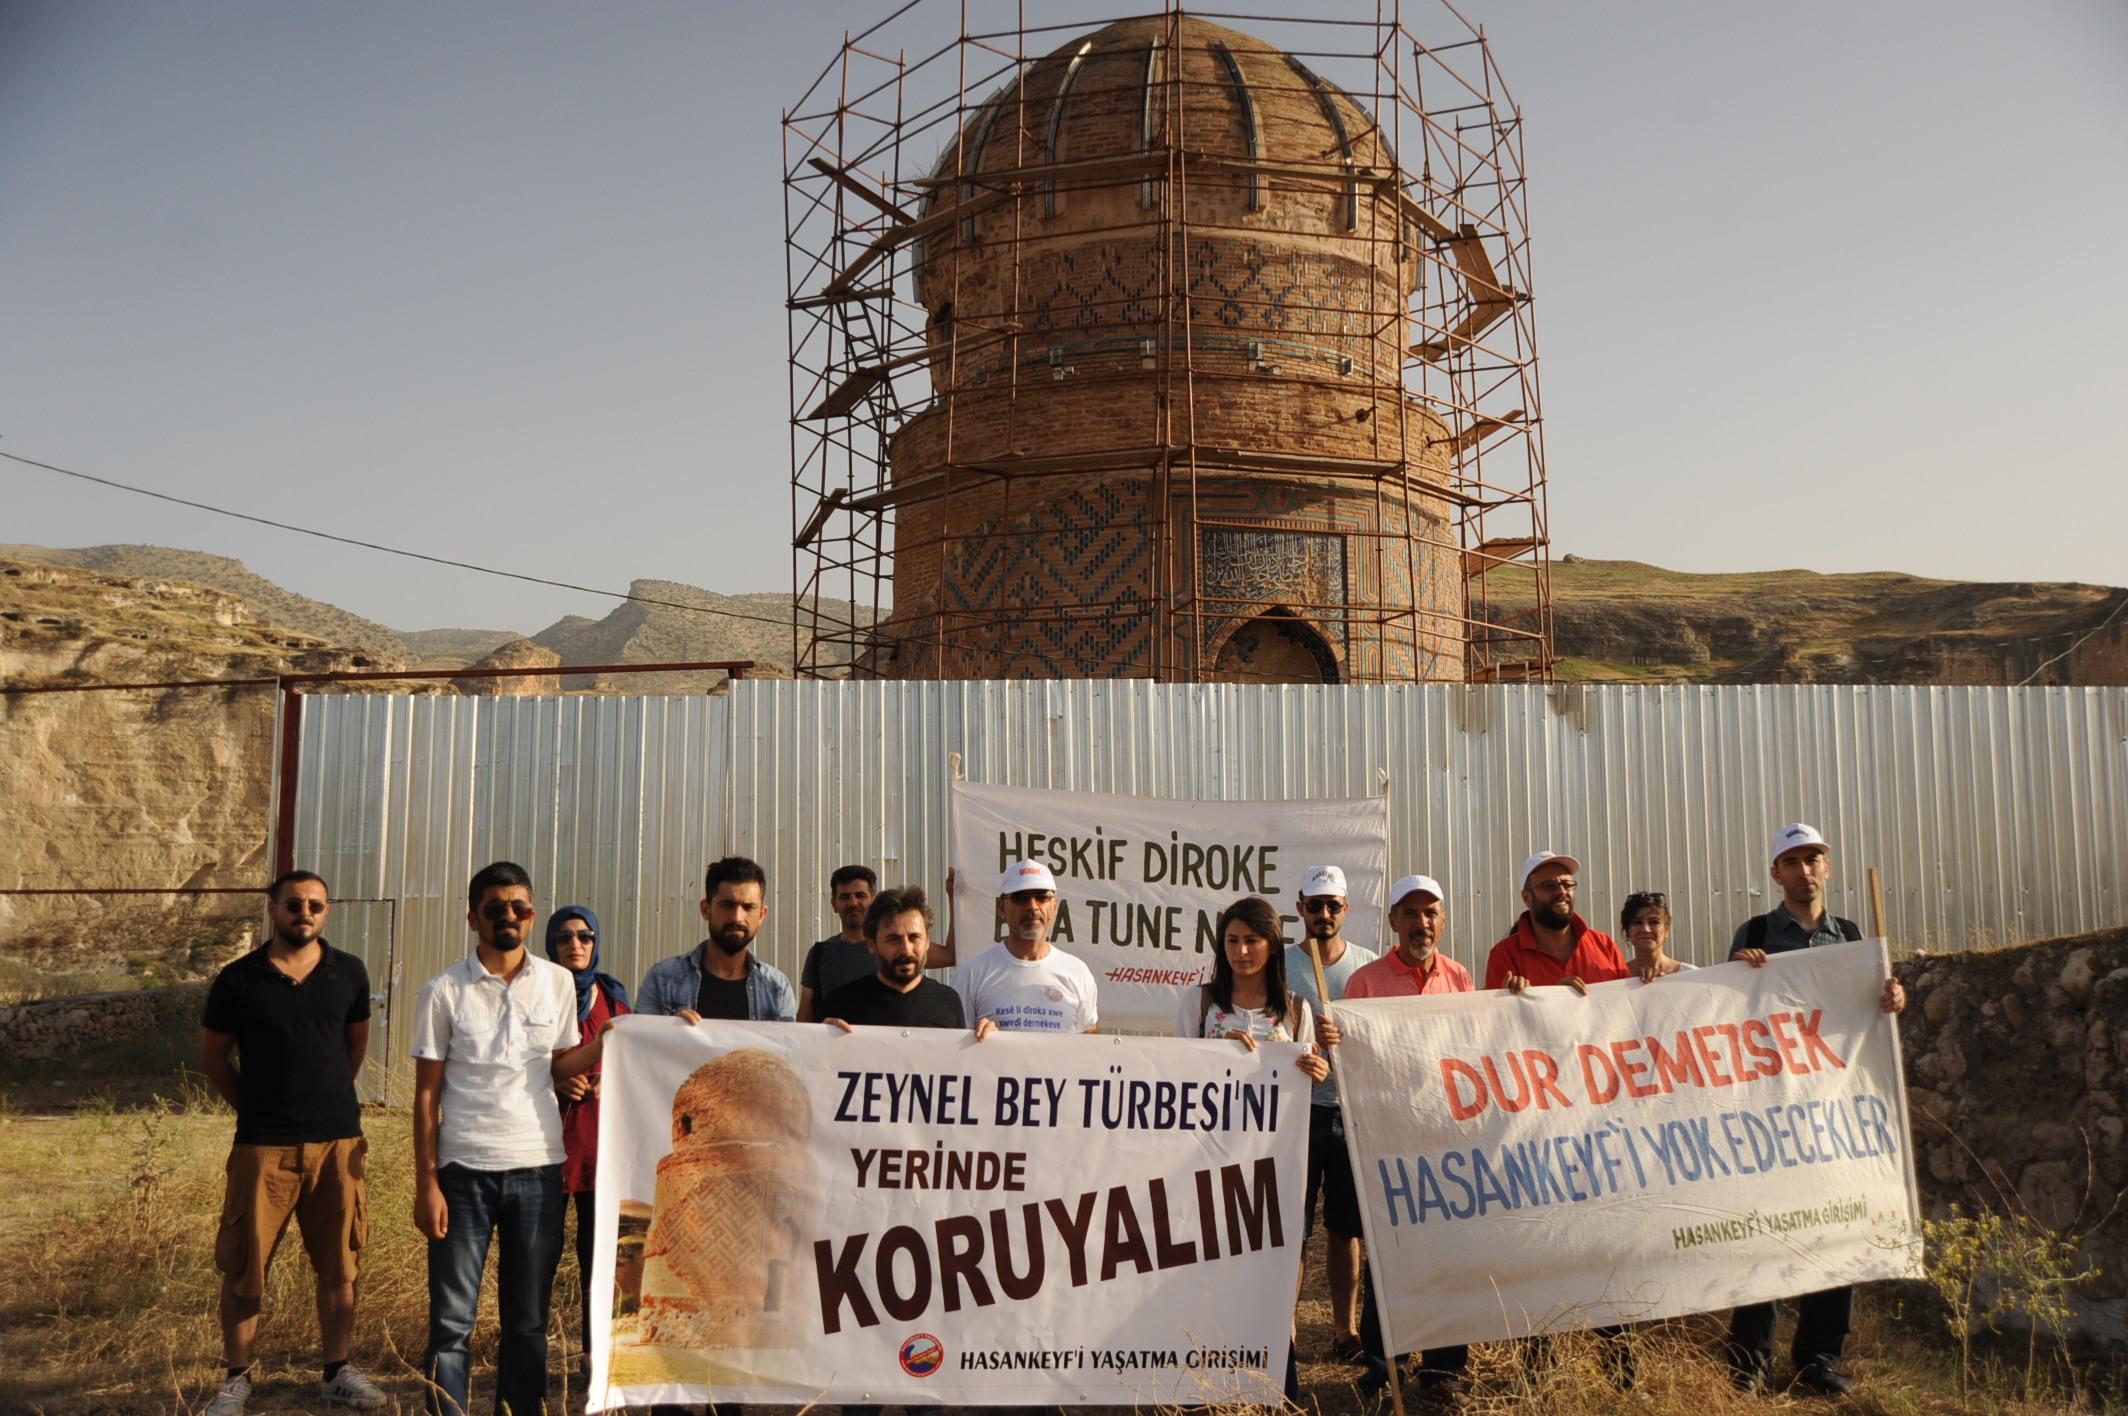 Current developments in the Ilisu Dam project in Turkey